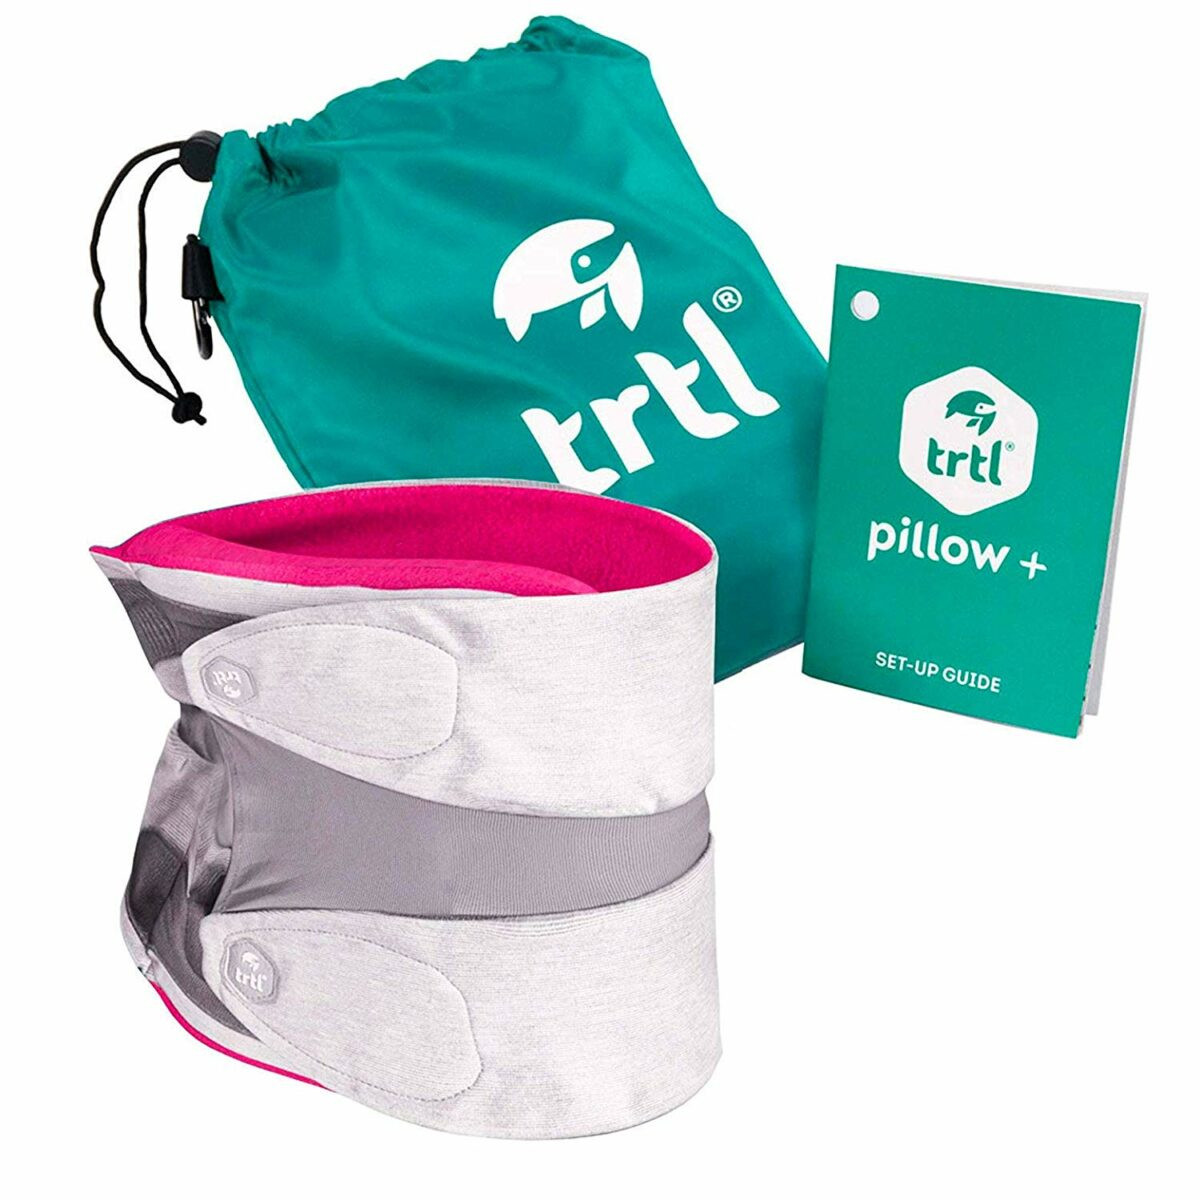 trtl travel pillow plus